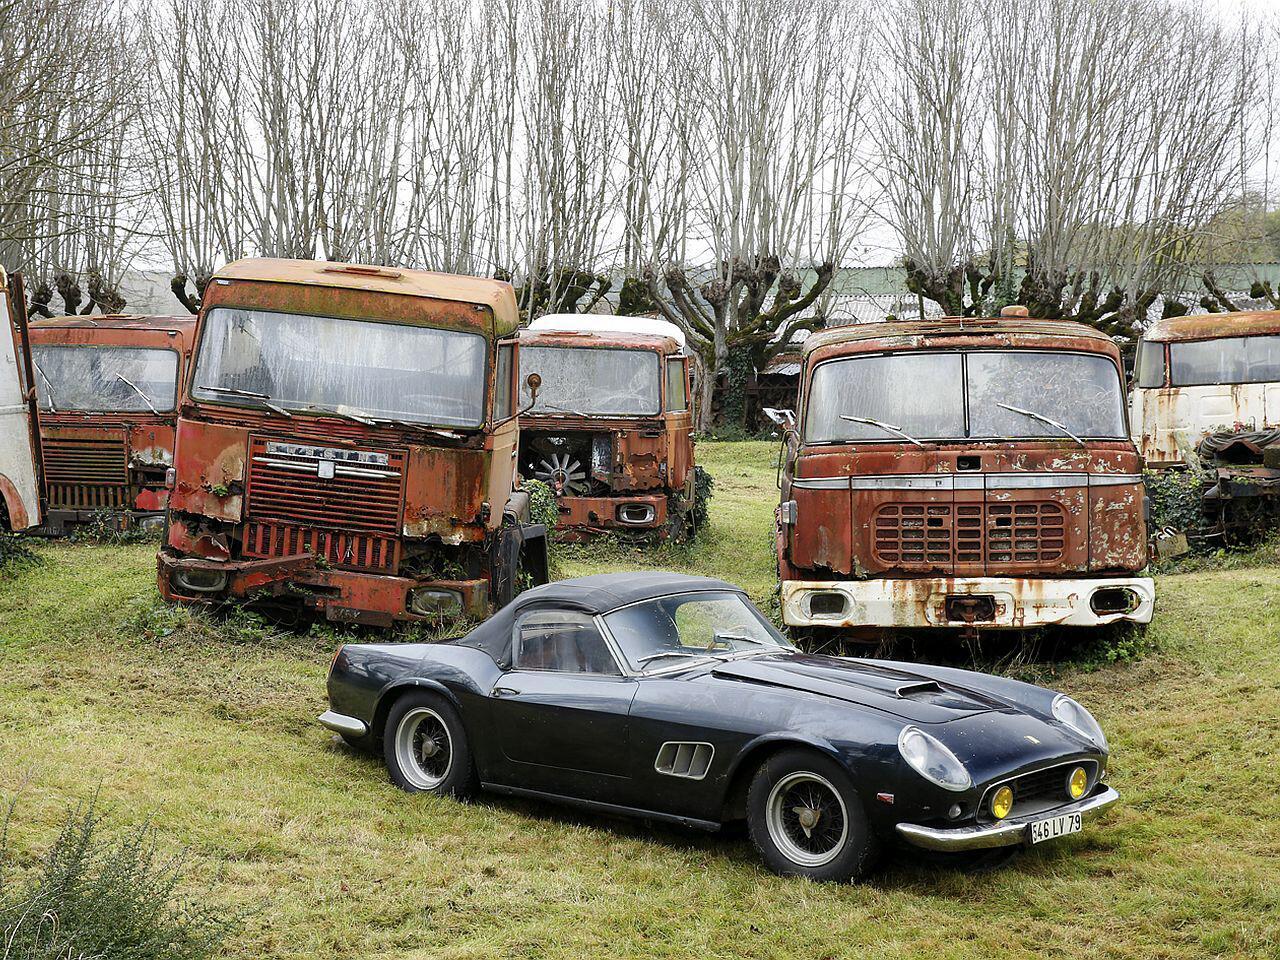 Bild zu Ferrari von Alain Delon